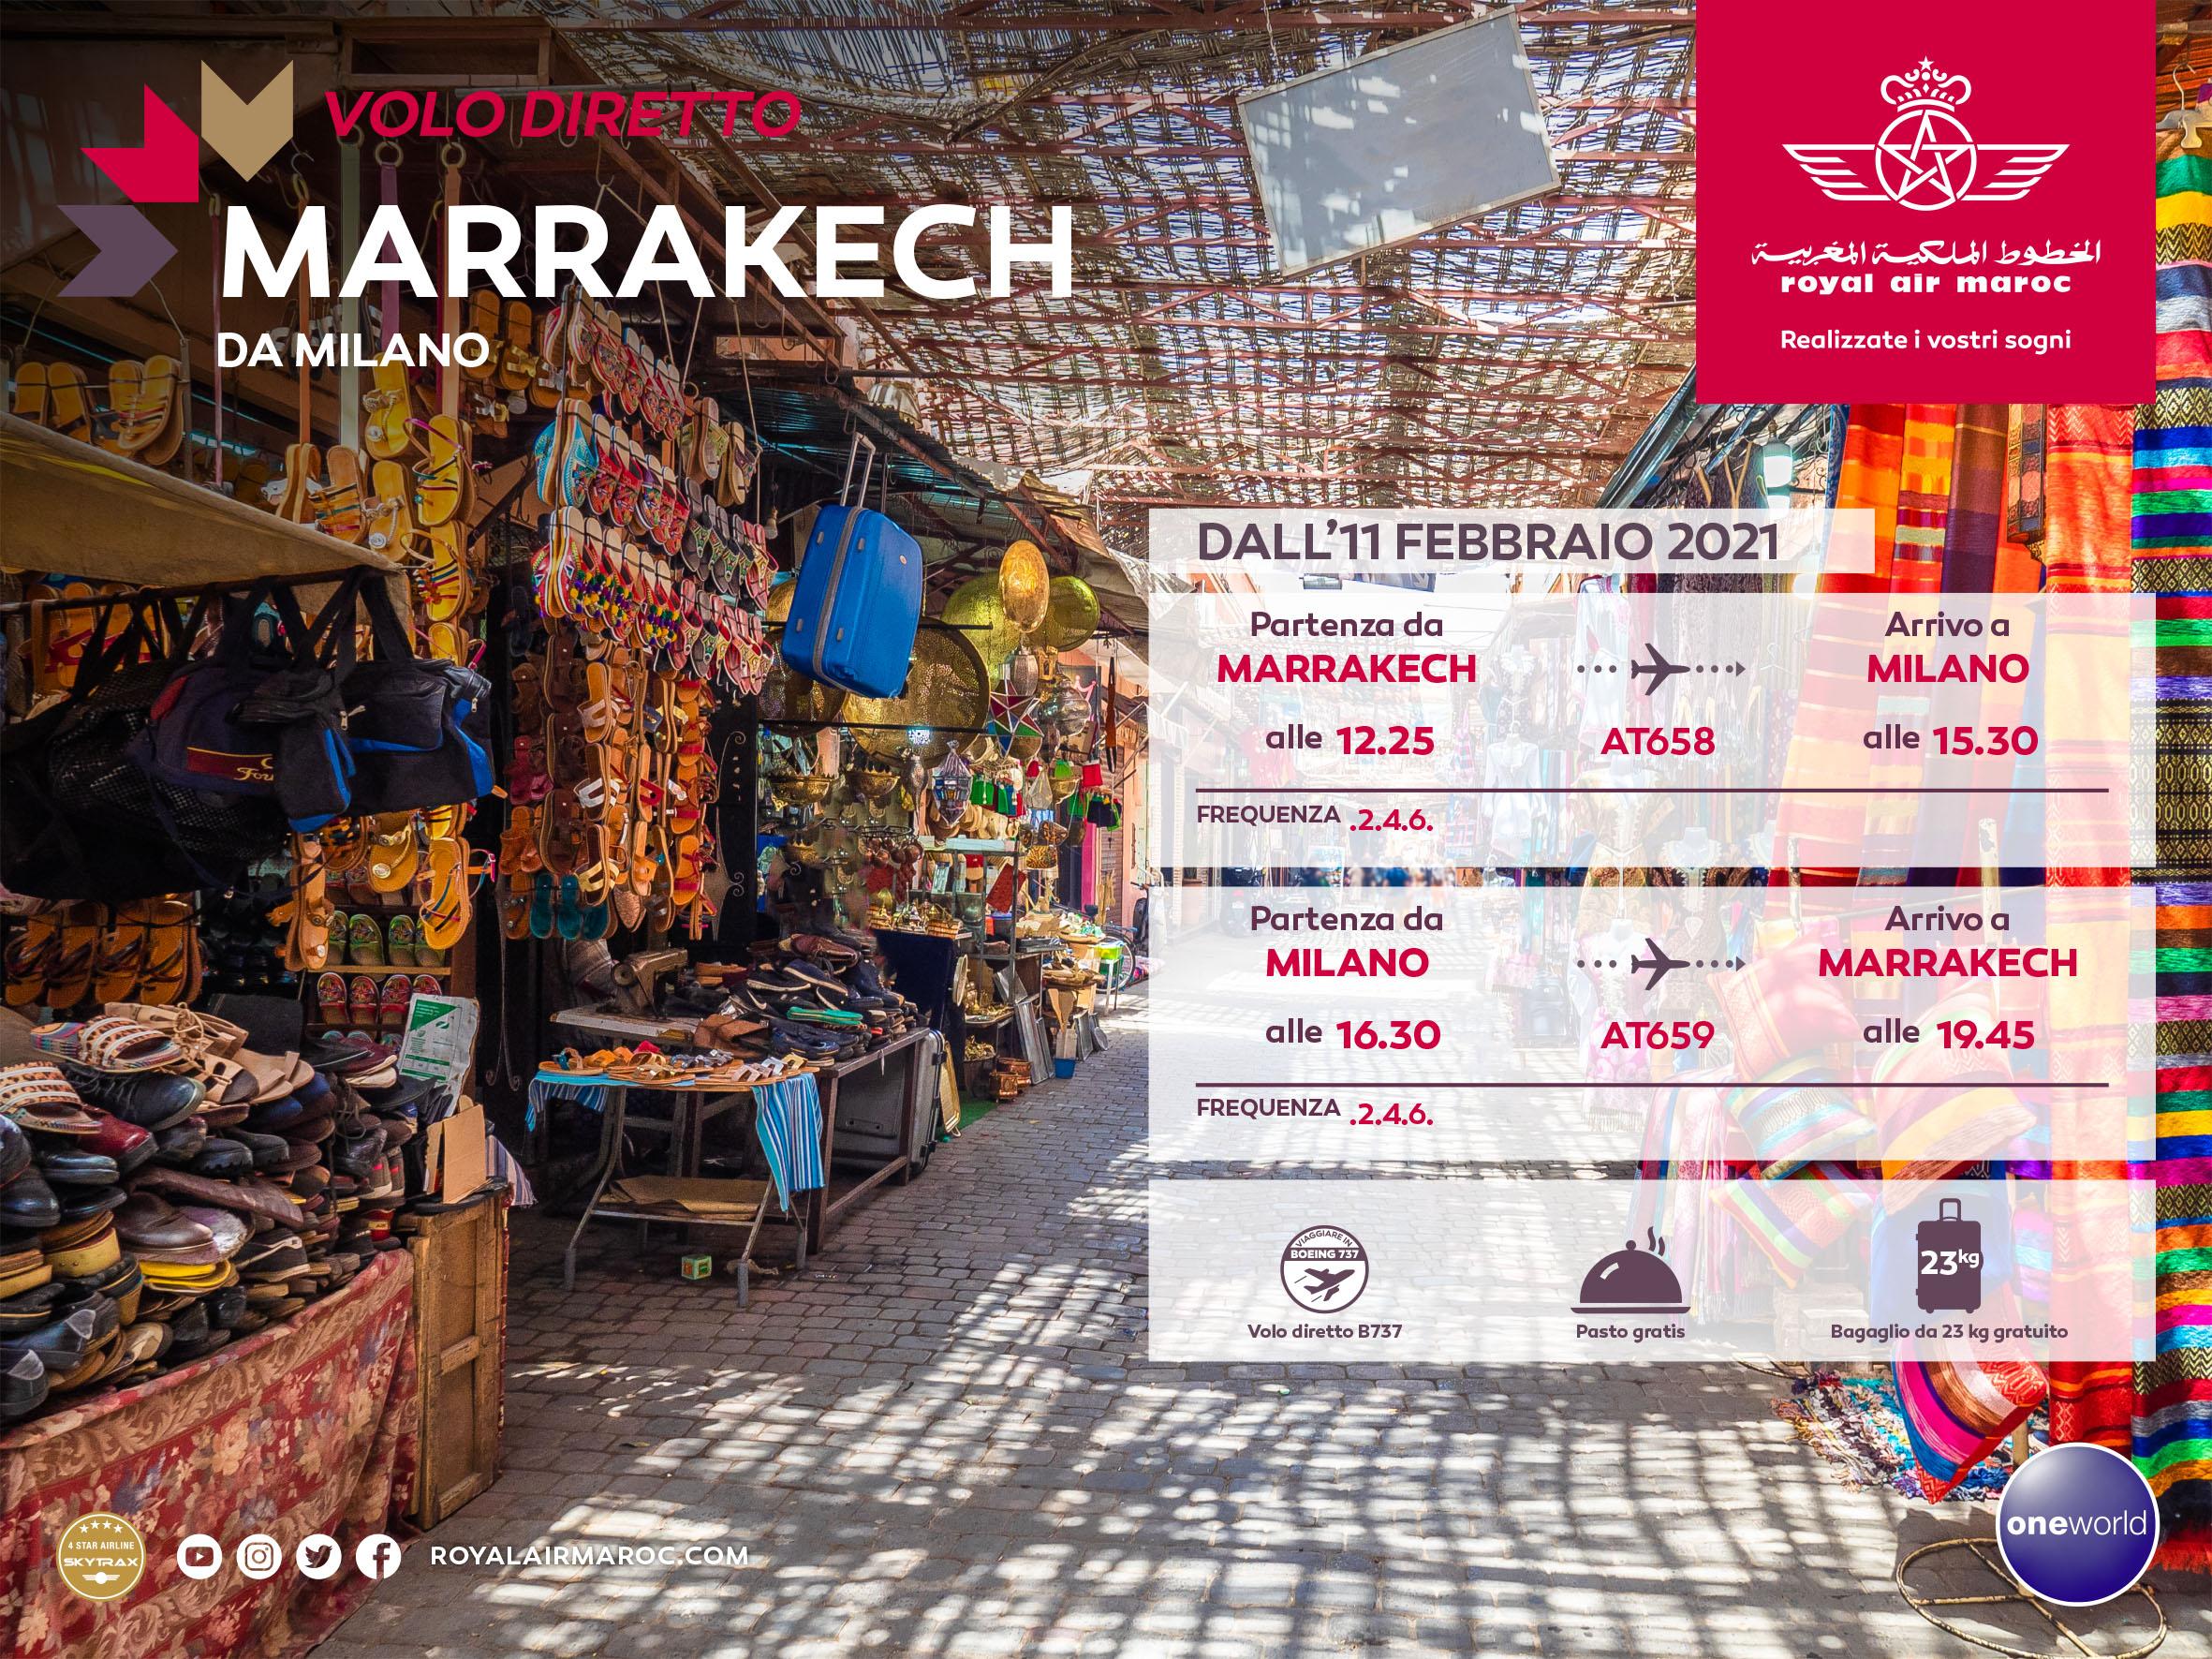 MOROCCO – as from 11/Feb/2021 a new RAM direct flight Milan/Marrakech